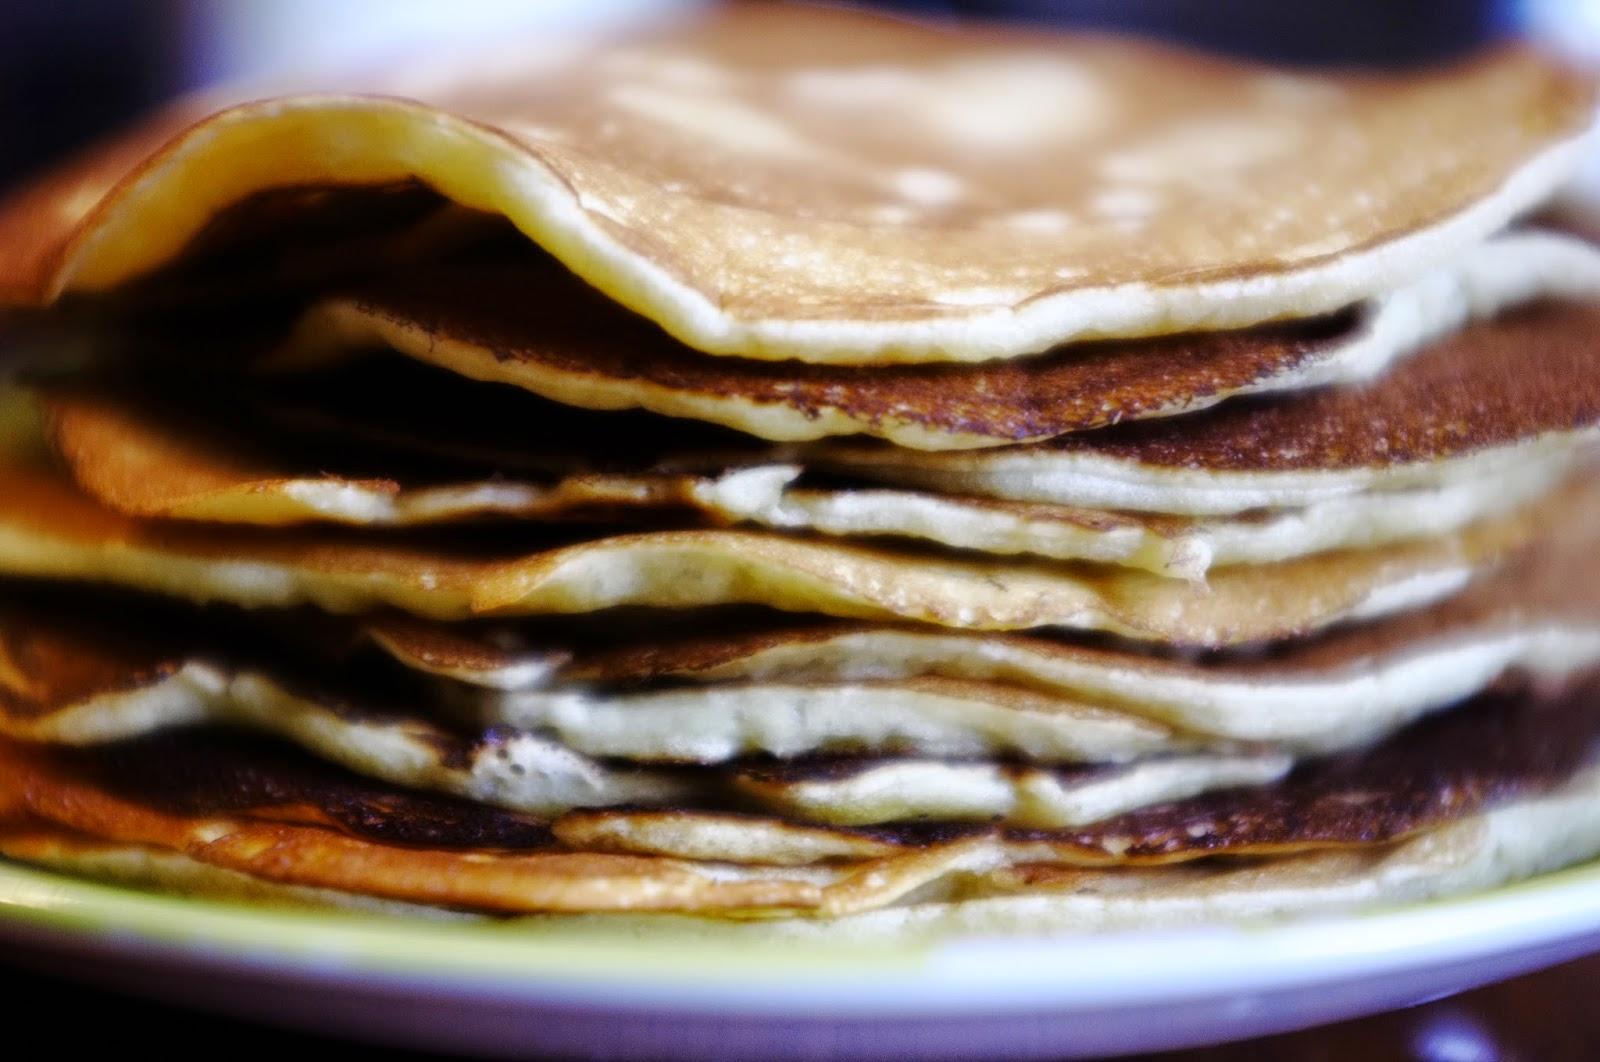 http://ielonah.blogspot.fr/2014/07/pancakes-avec-amour.html